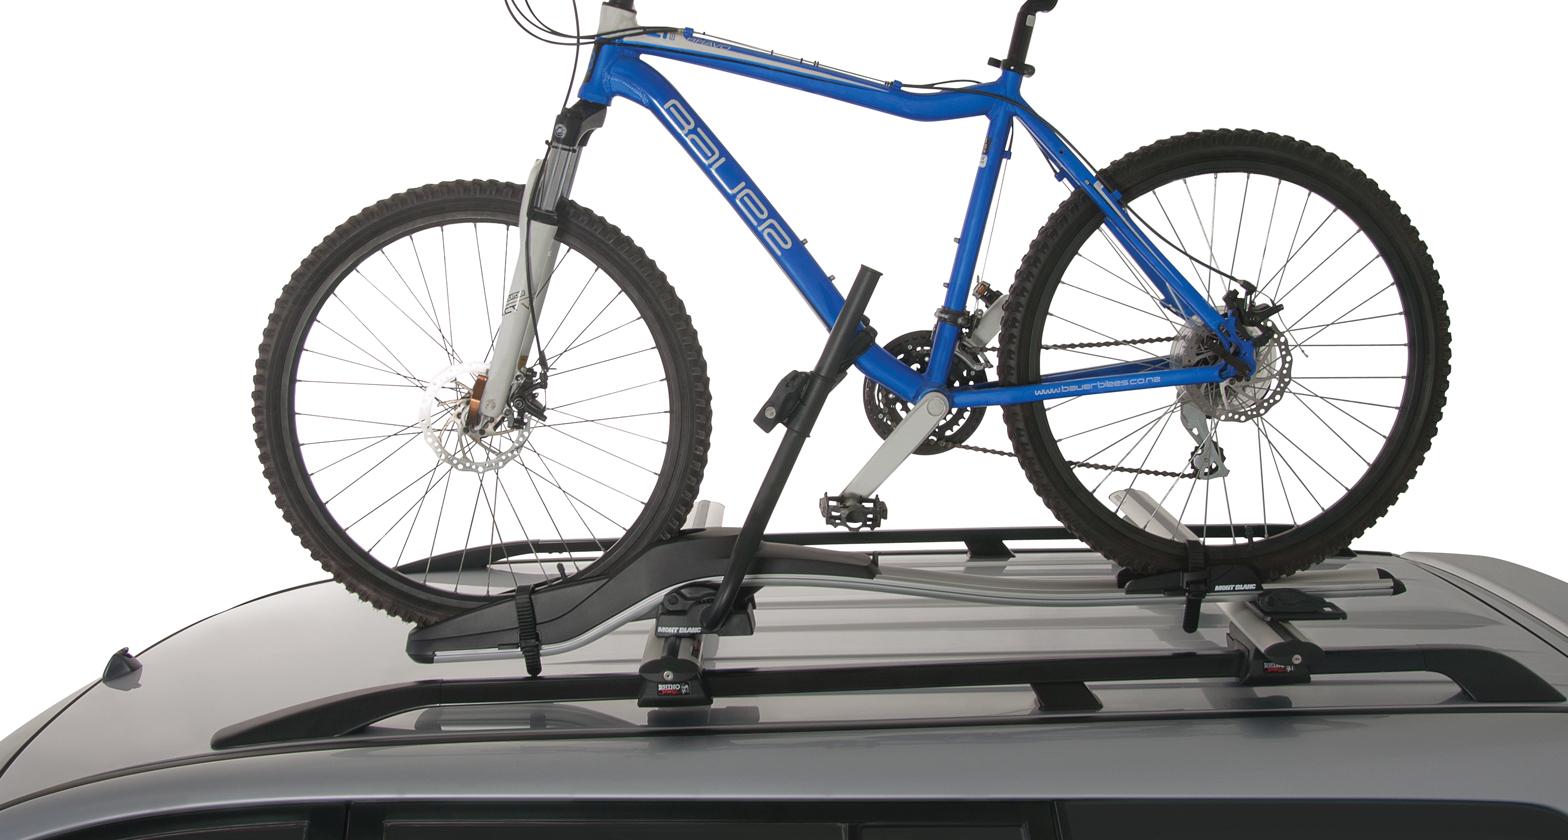 Roof bar bike carrier